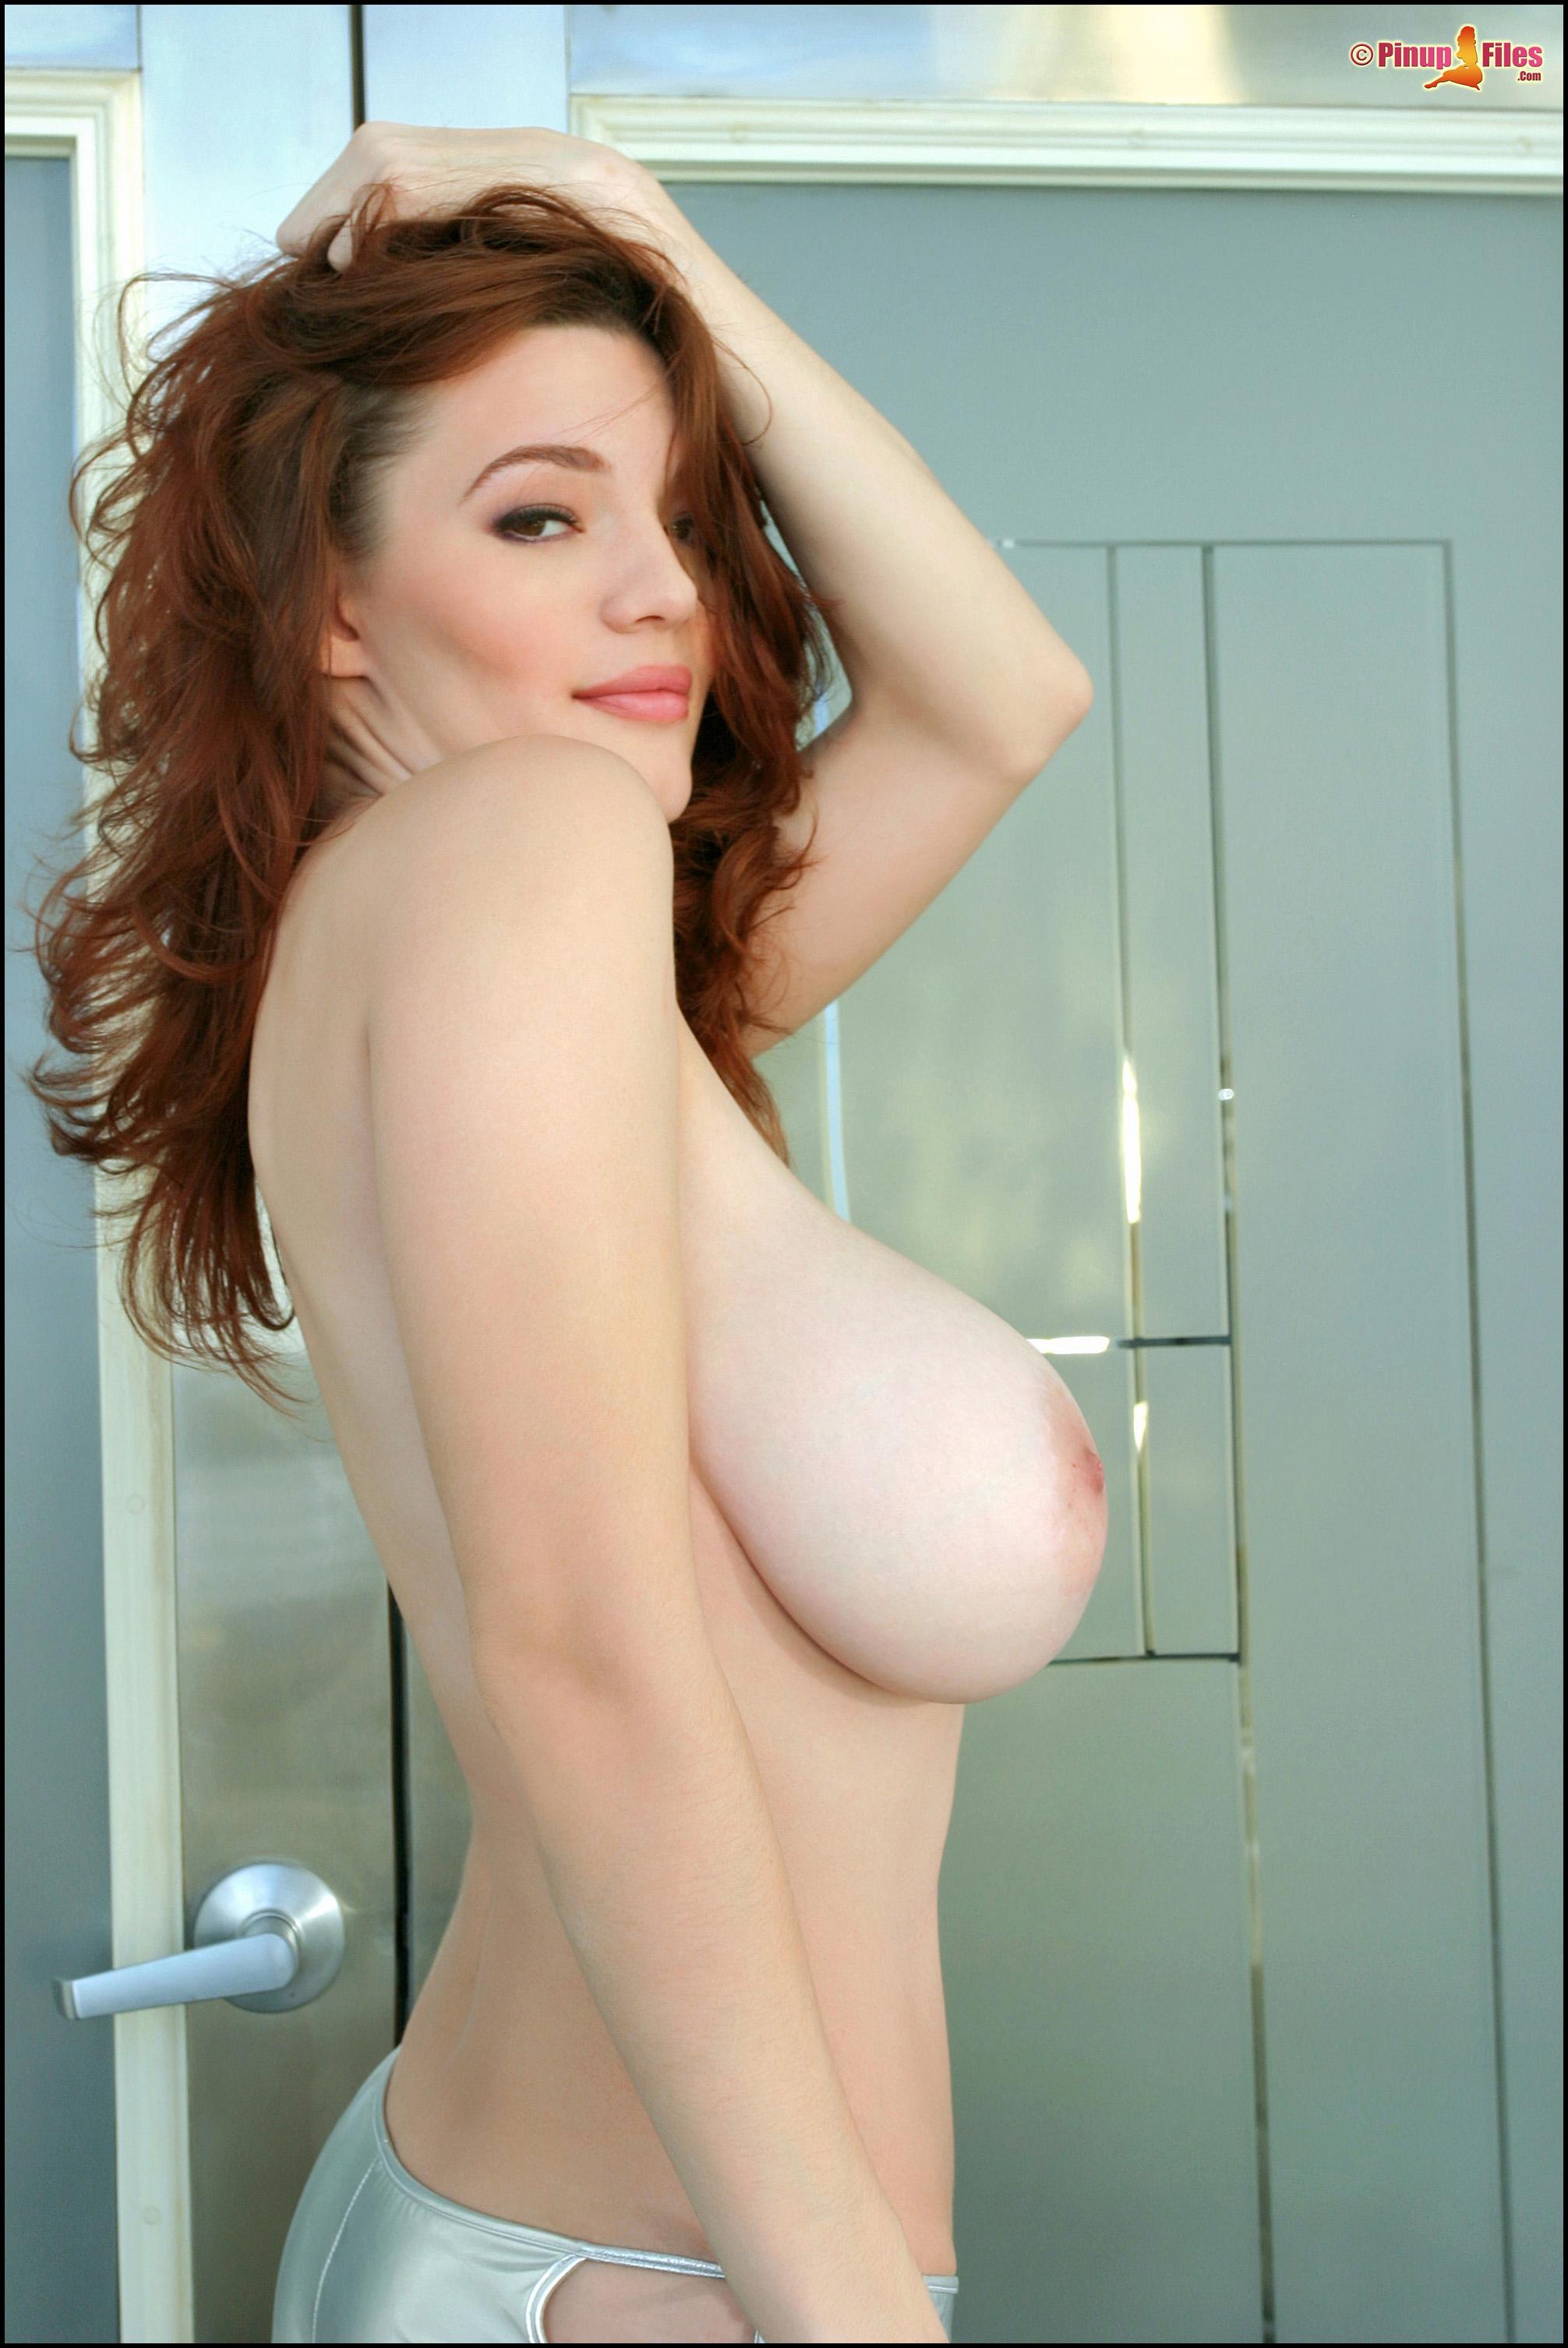 big boob file